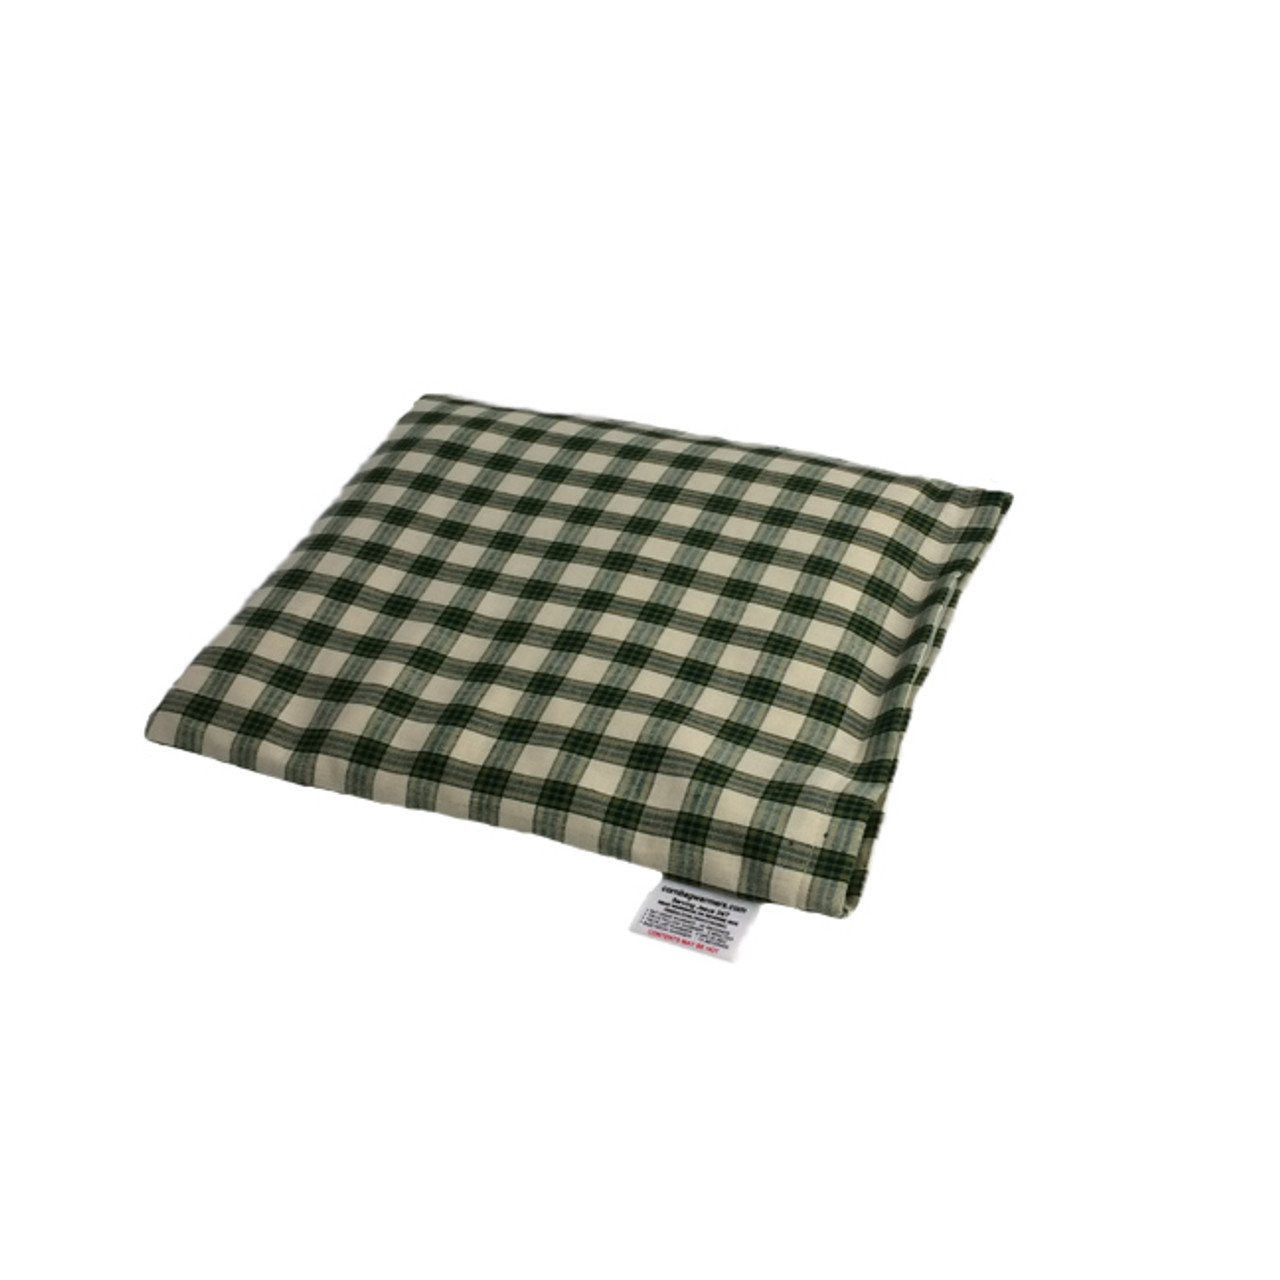 Plaid- Green Pillow Warmer Microwave Heating Pad